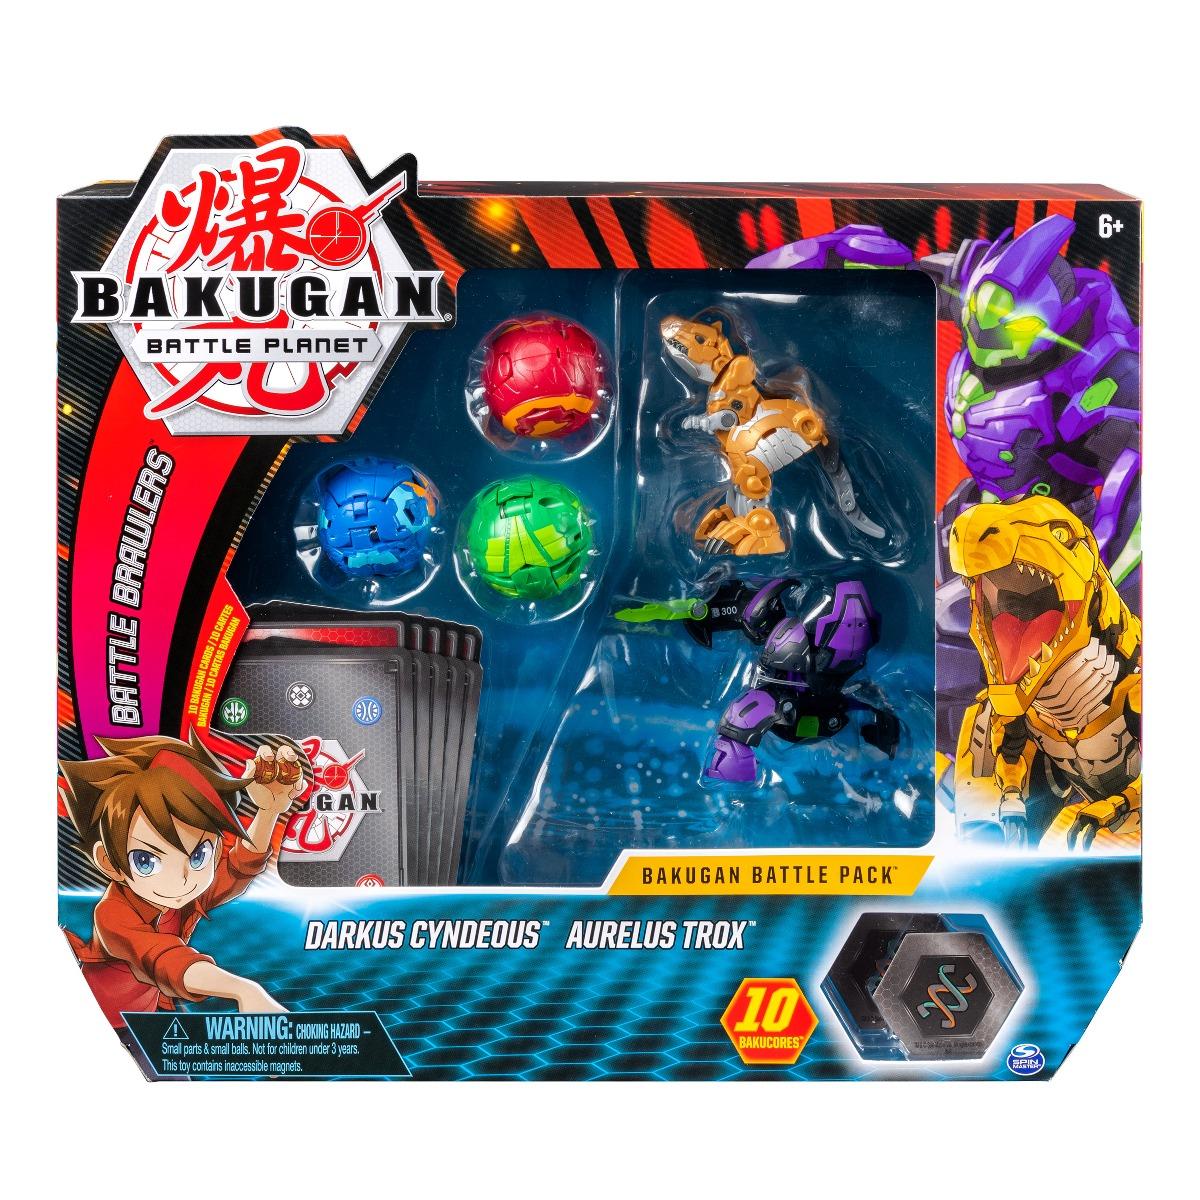 Set 5 Bakugan Battle Planet, Darkus Cyndeous, Aurelus Trox, 20108832